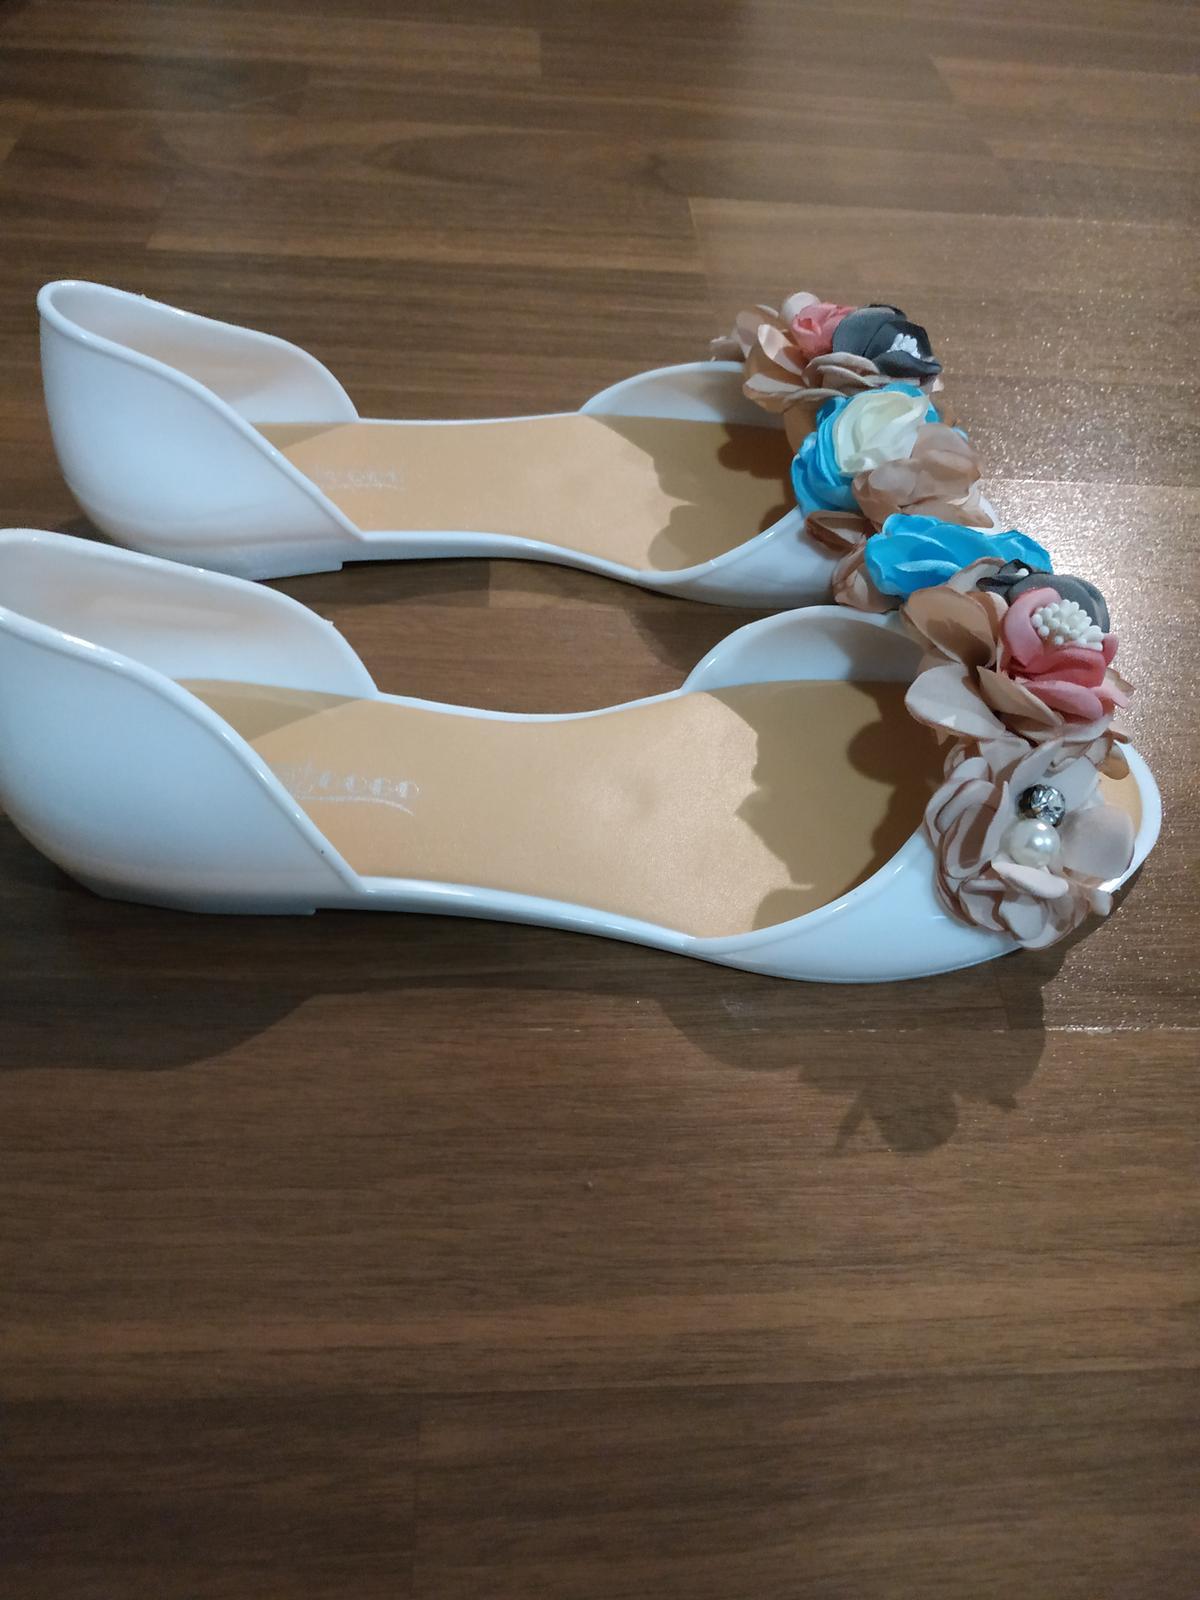 Boty s modrýma kytičkama - Obrázek č. 2